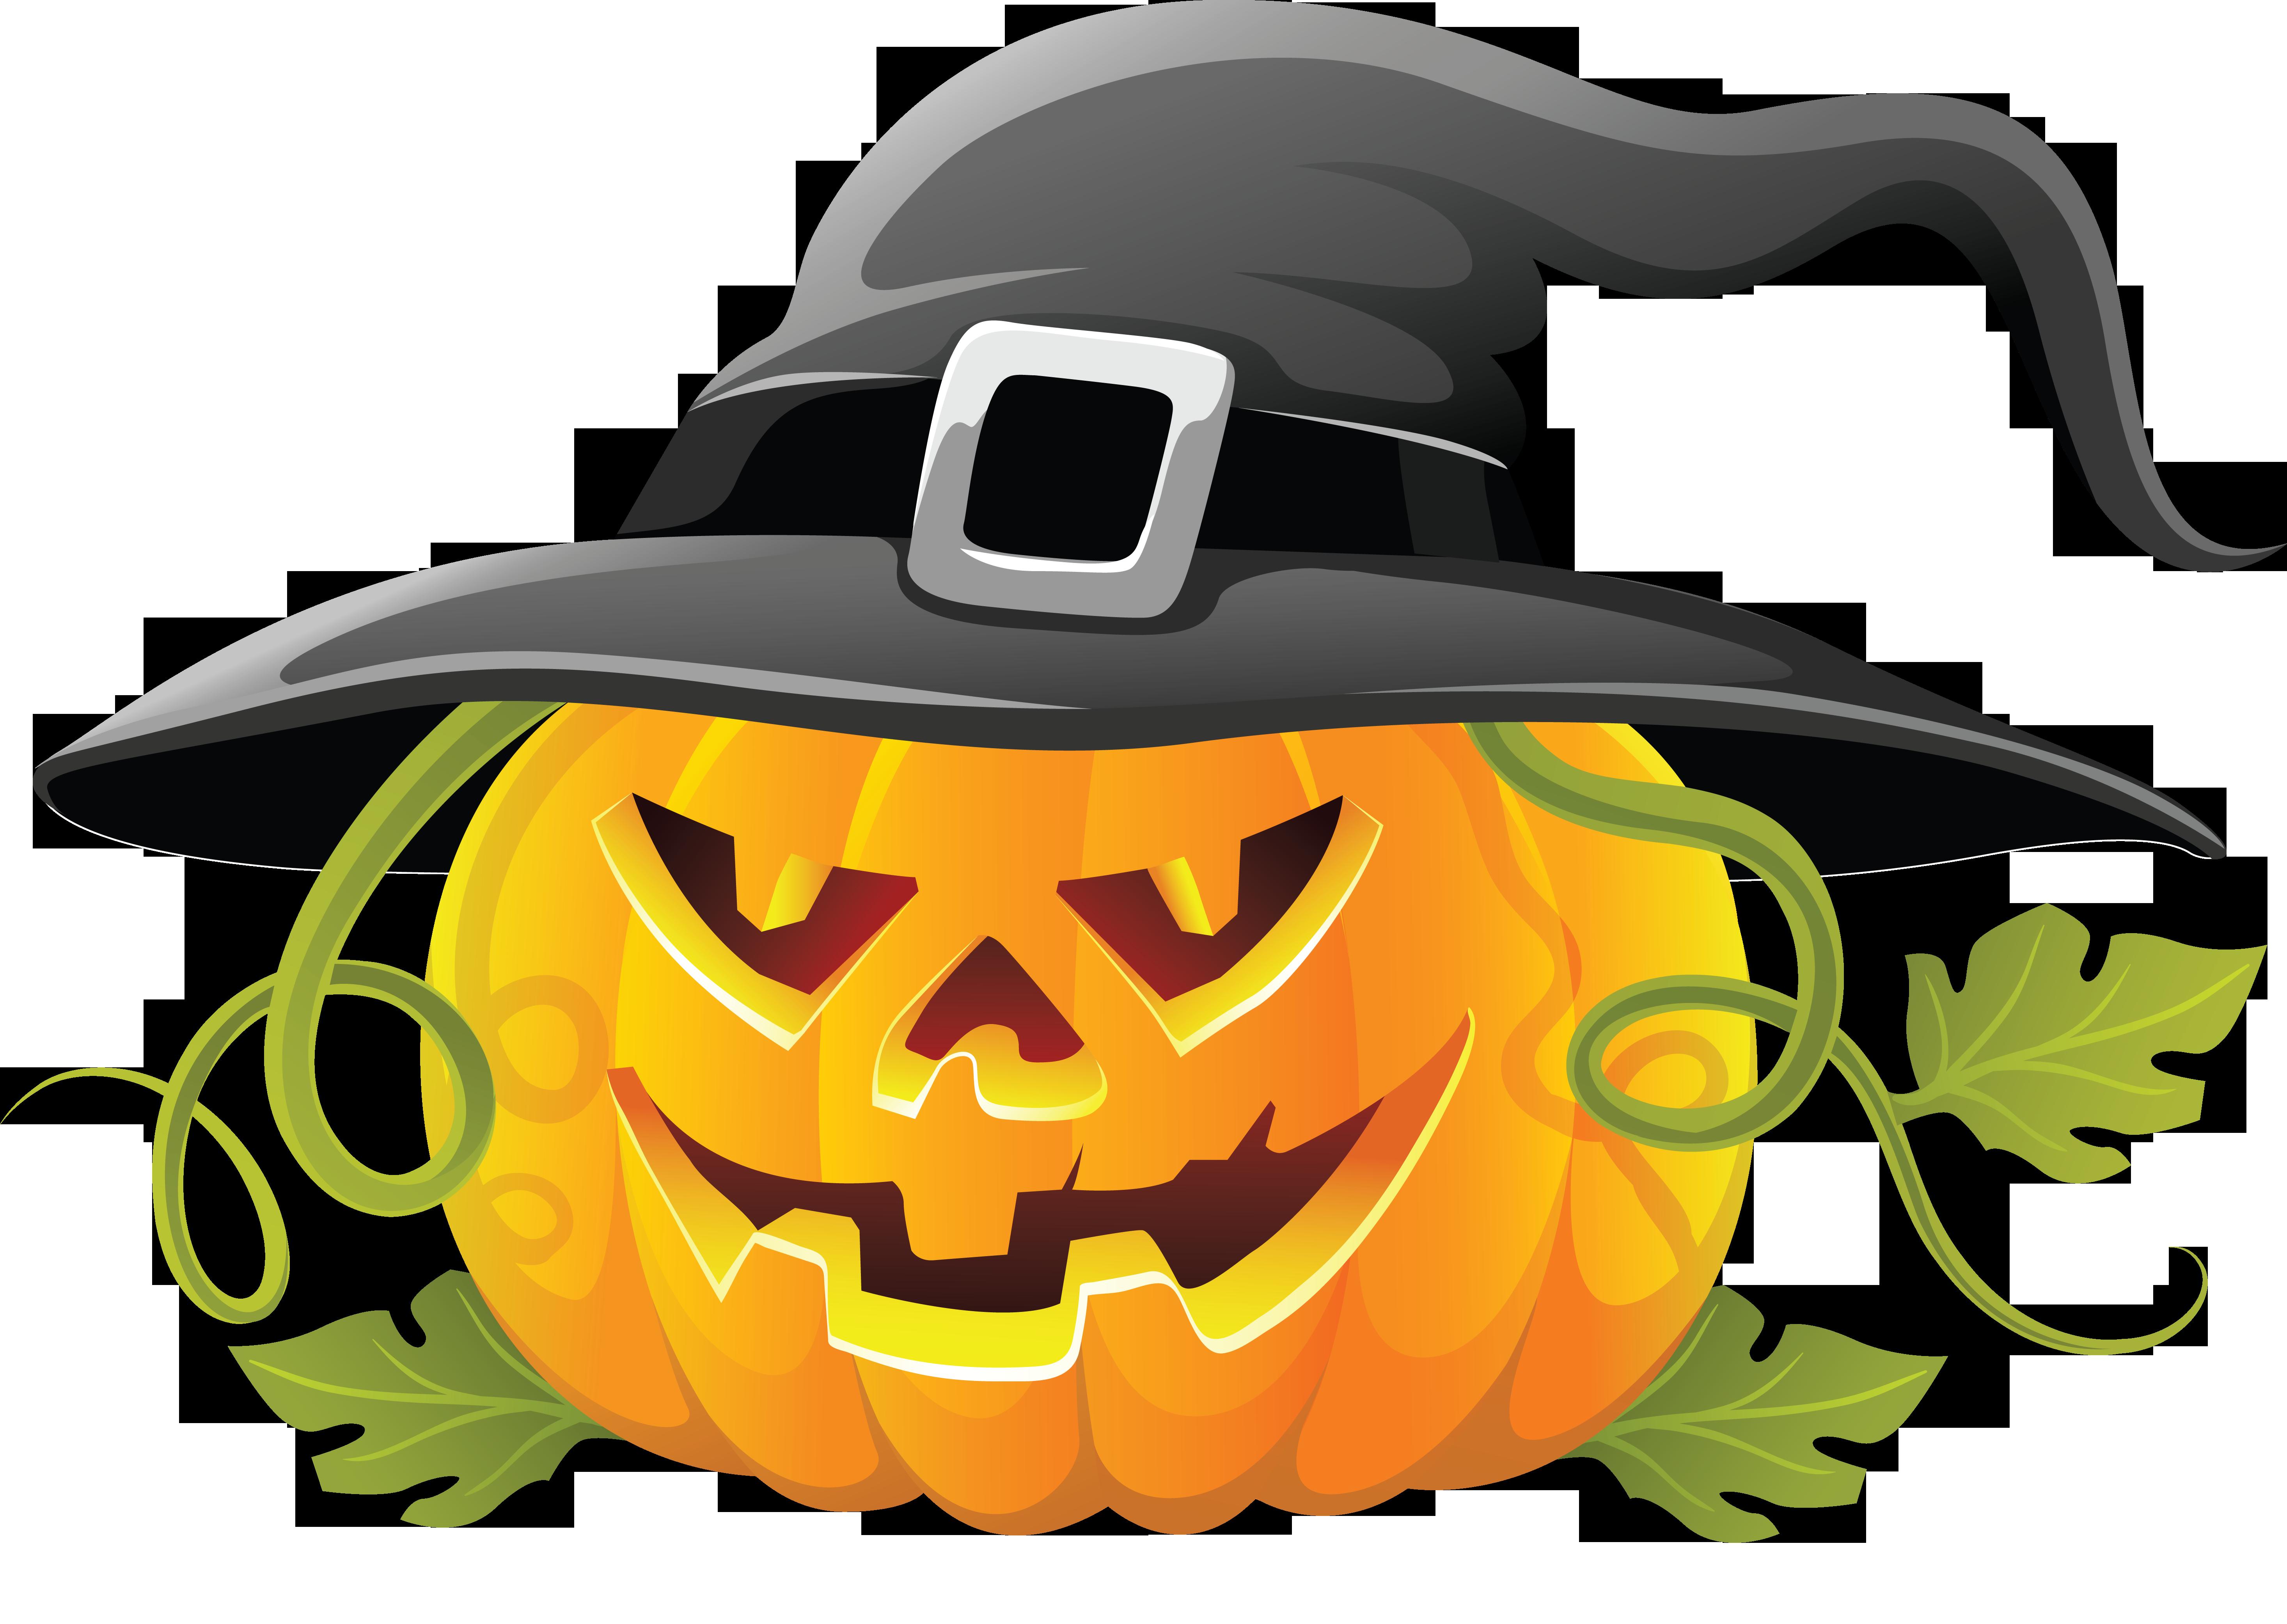 5863x4163 Halloween Jack O' Lantern Png Clipart